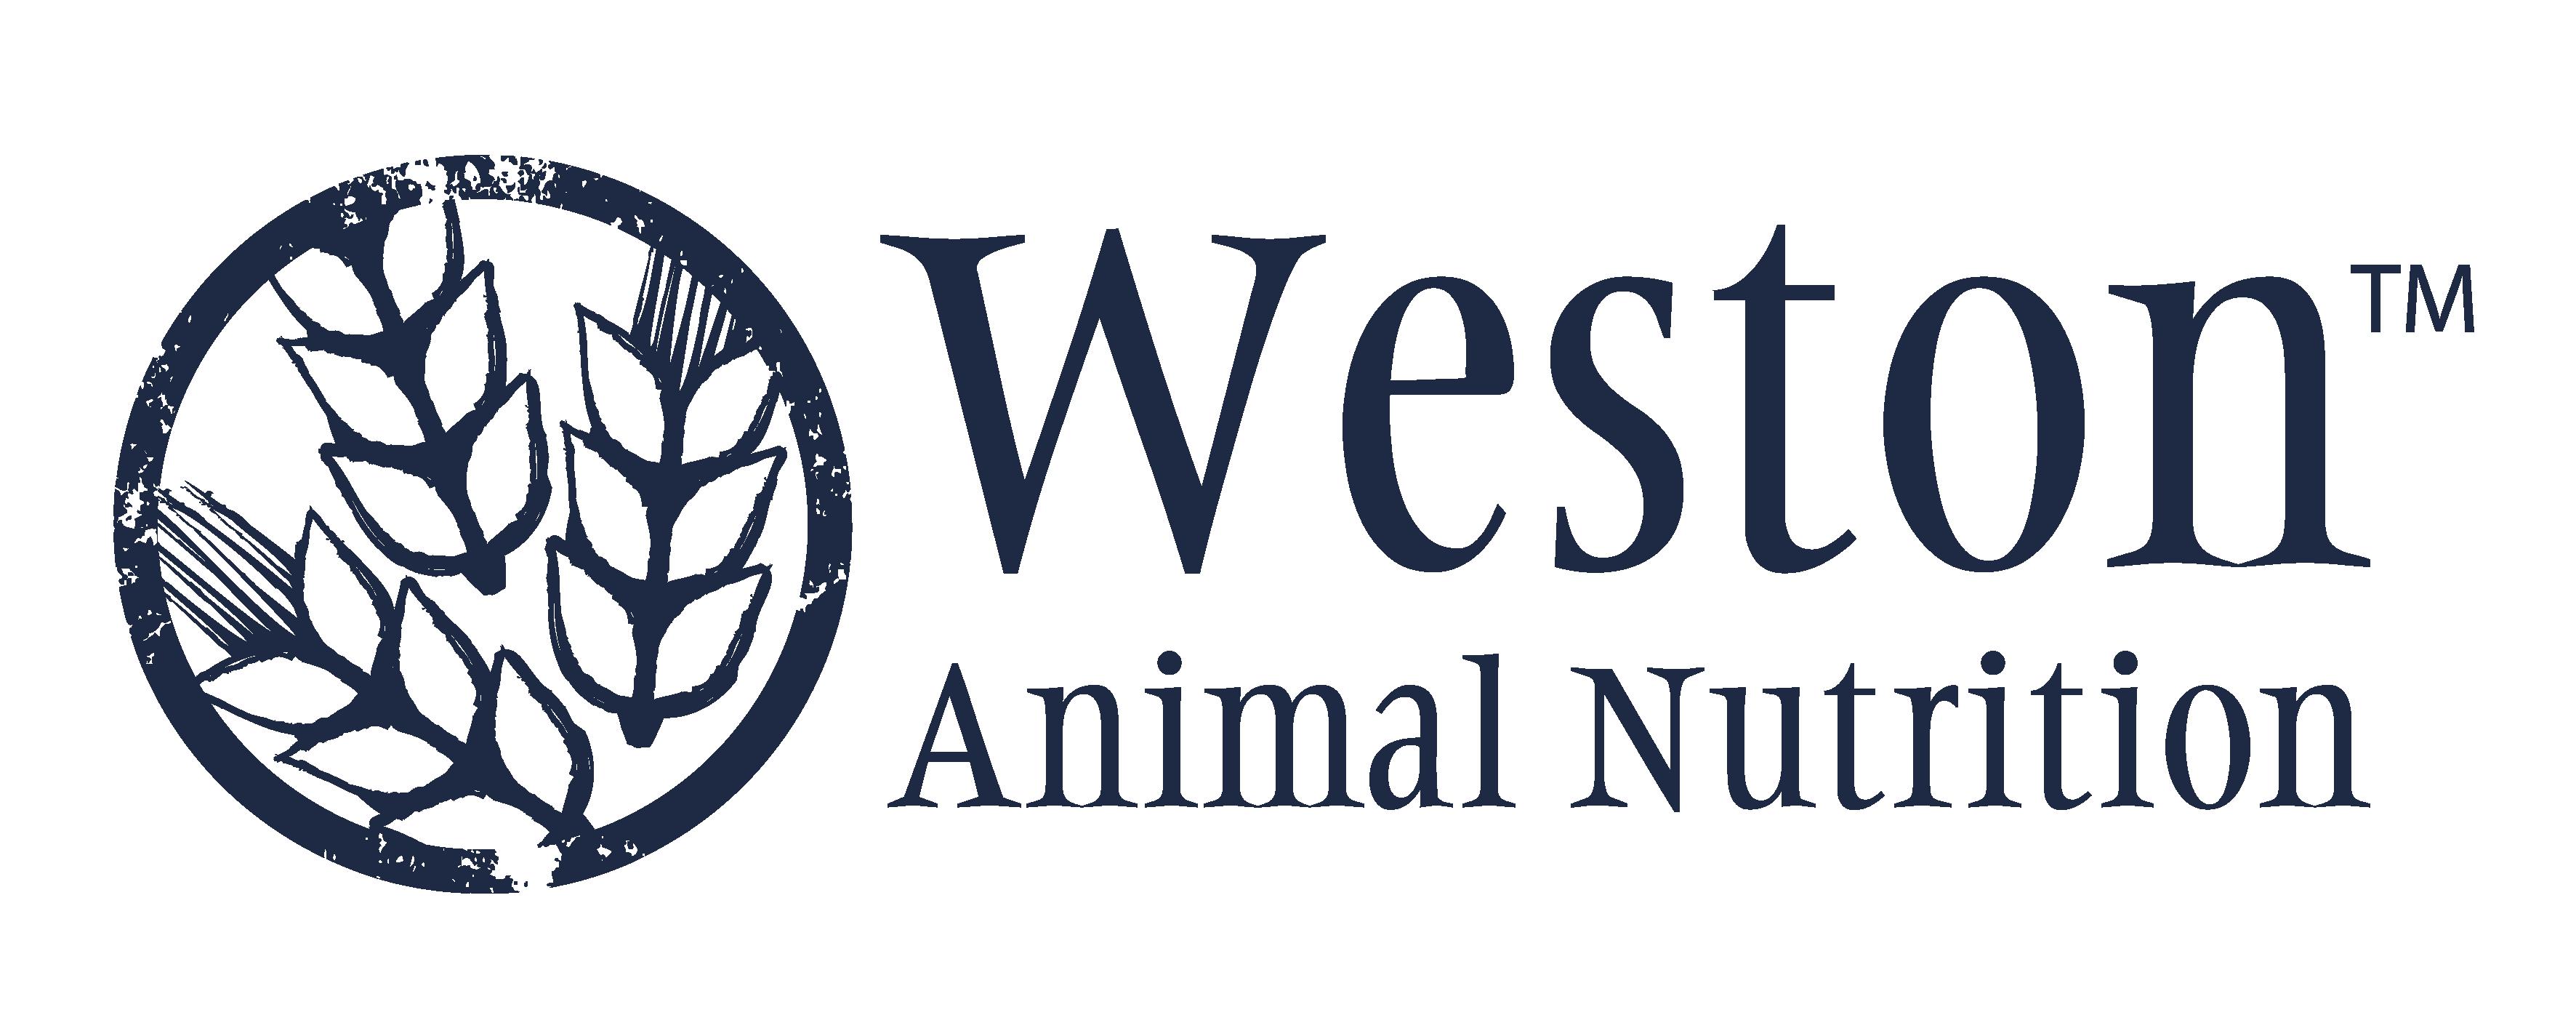 Weston Animal Nutrition